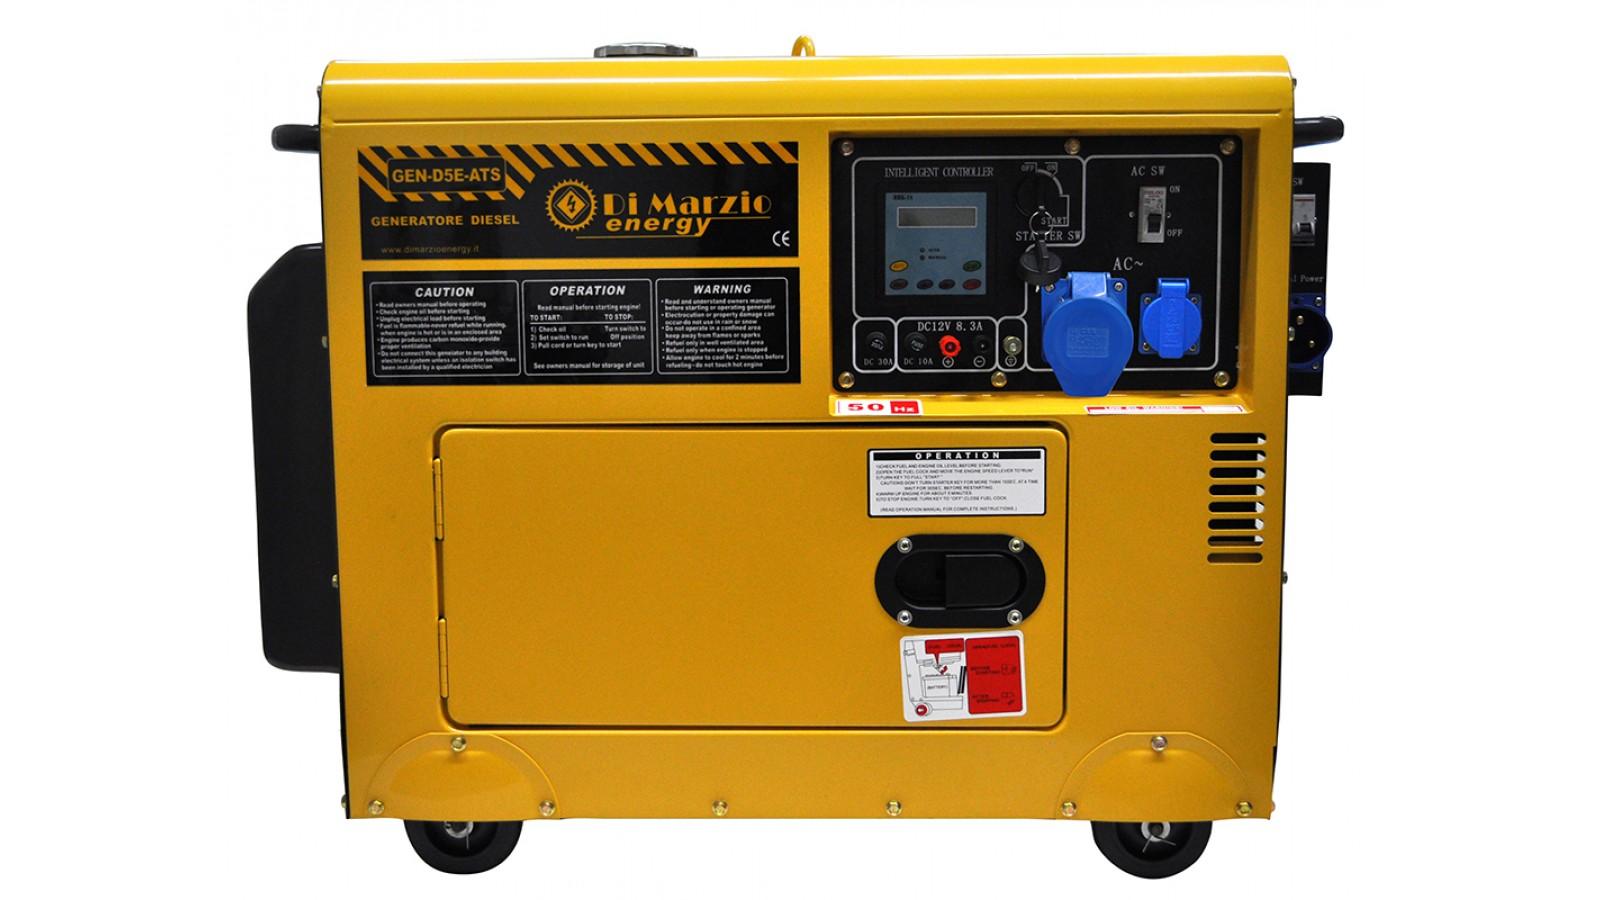 Generatore di corrente diesel 4 5 kw gruppo elettrogeno for Generatore di corrente diesel usato